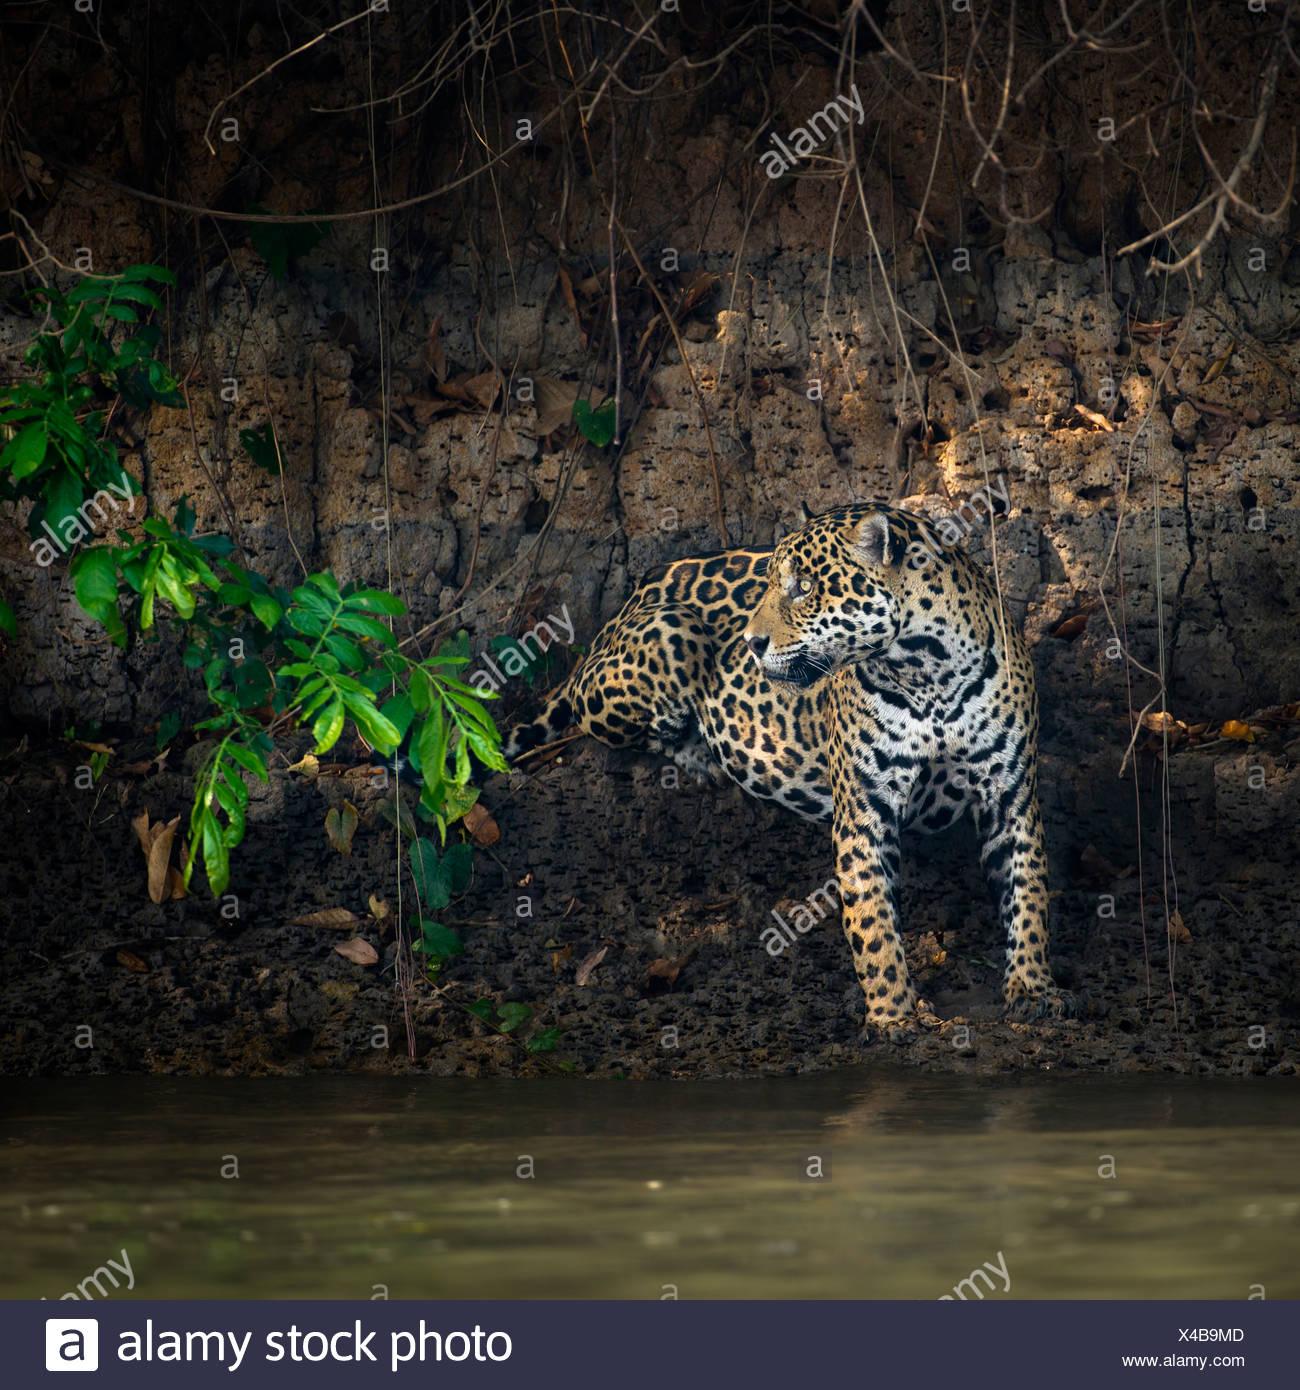 Wilde männliche Jaguar am Rande des Piquiri River, ein Nebenfluss des Cuiaba Fluss, nördliche Pantanal, Brasilien. Stockbild